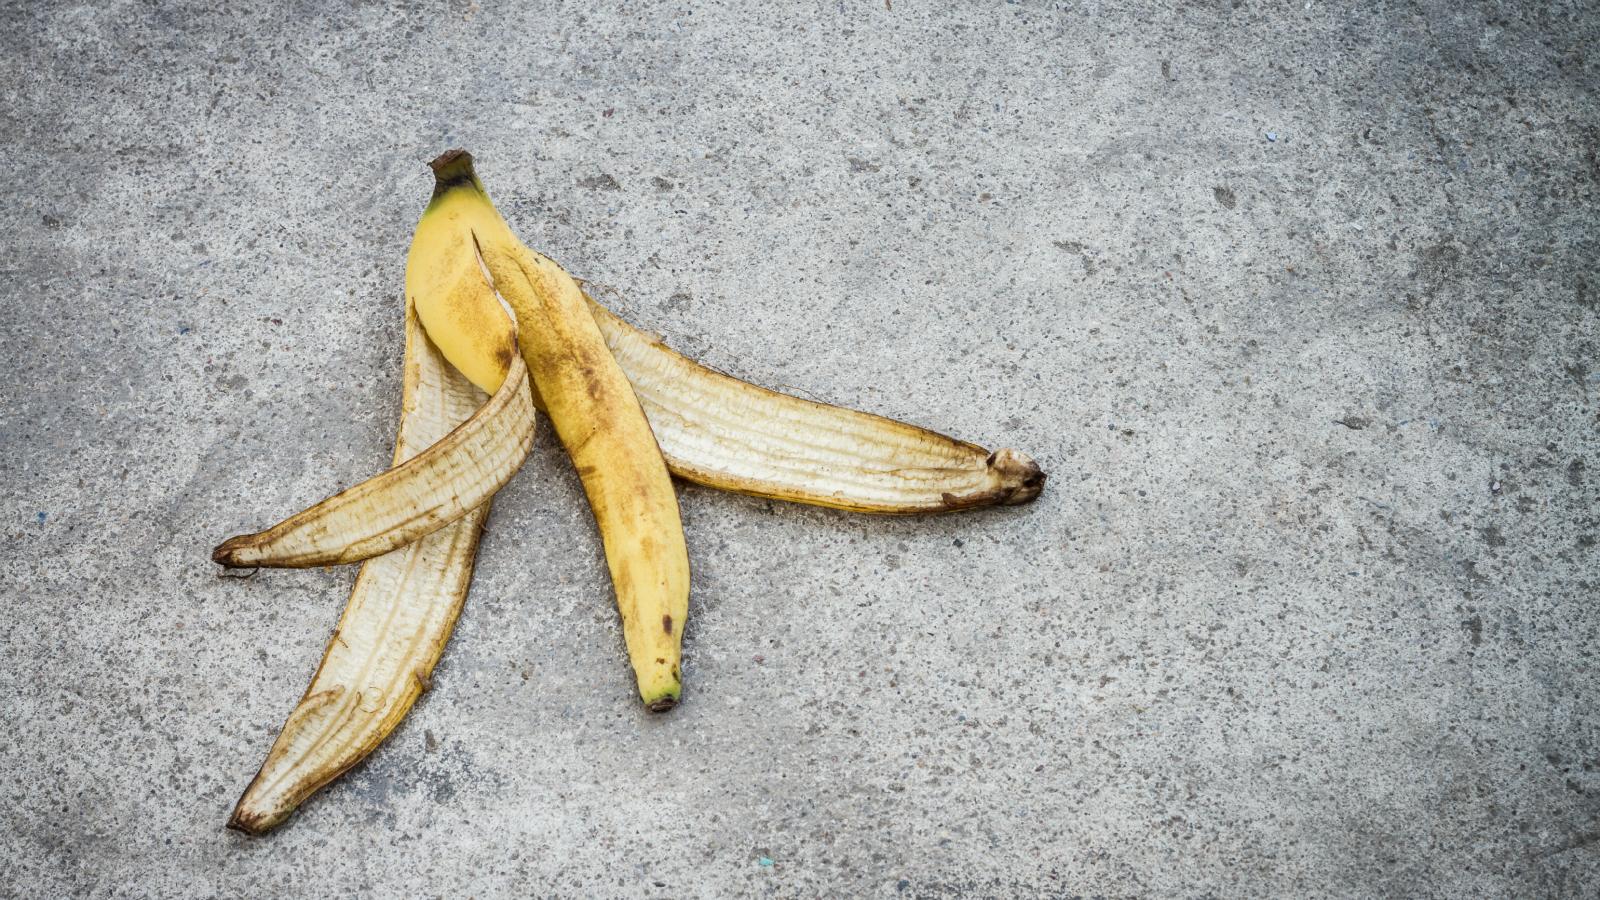 banana peel on the ground